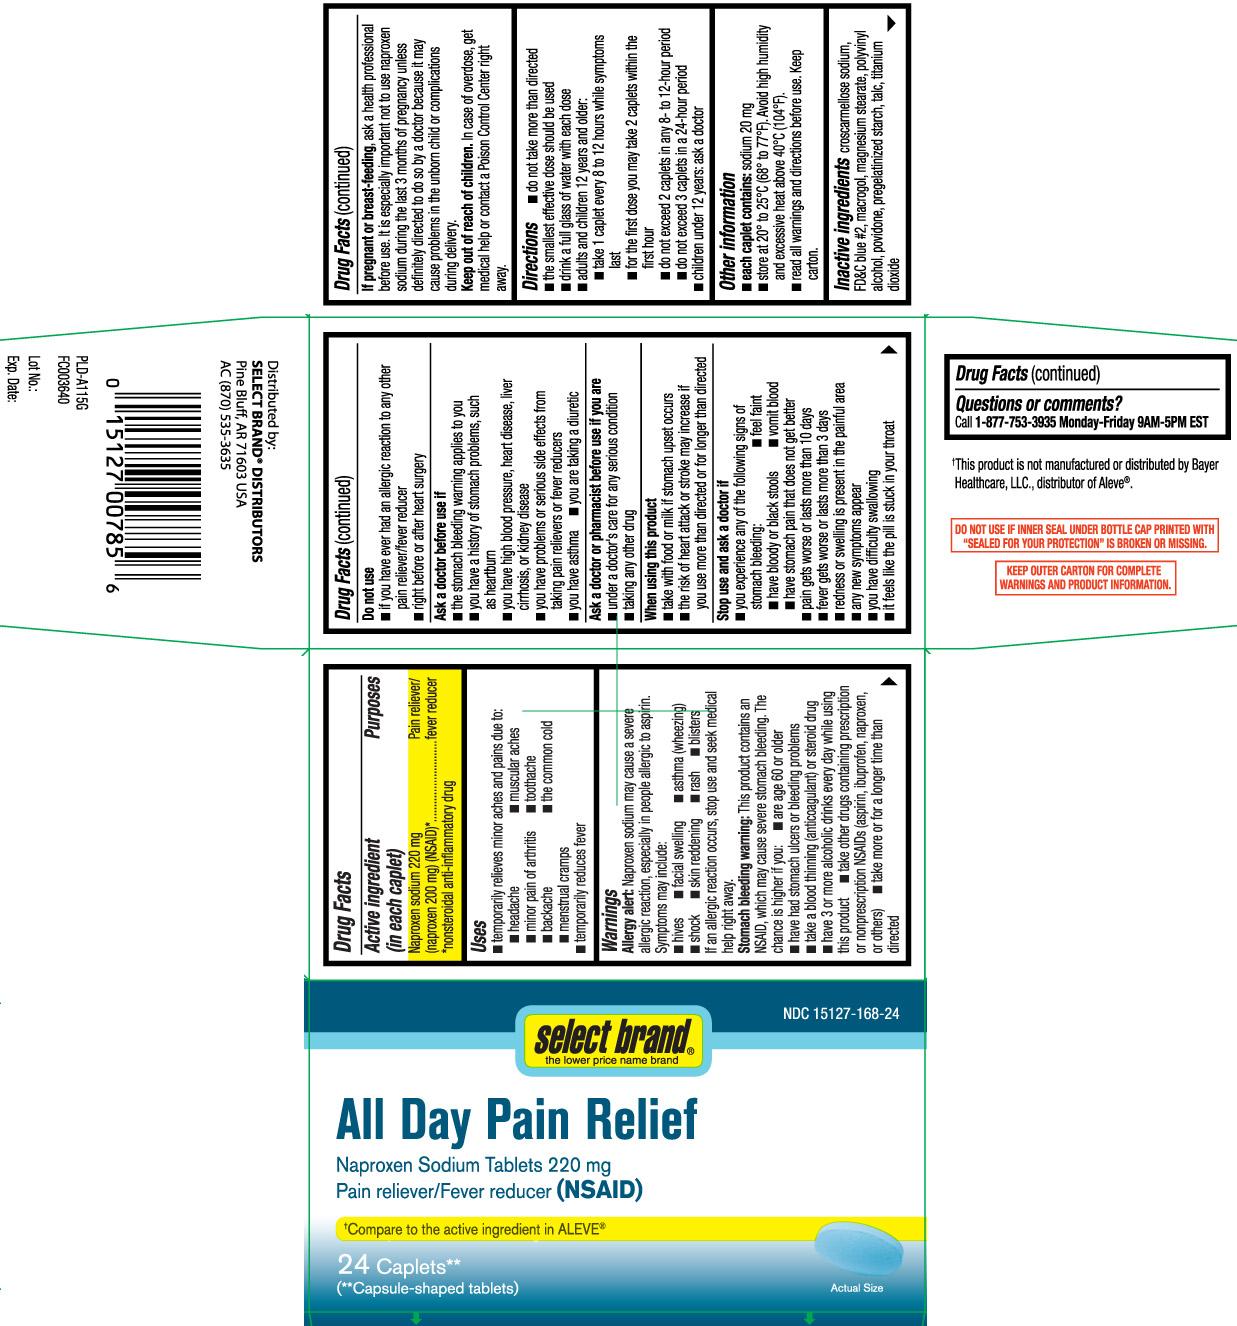 Naproxen Sodium 220 mg, (naproxen 200 mg) (NSAID)* *nonsteroidal anti-inflammatory